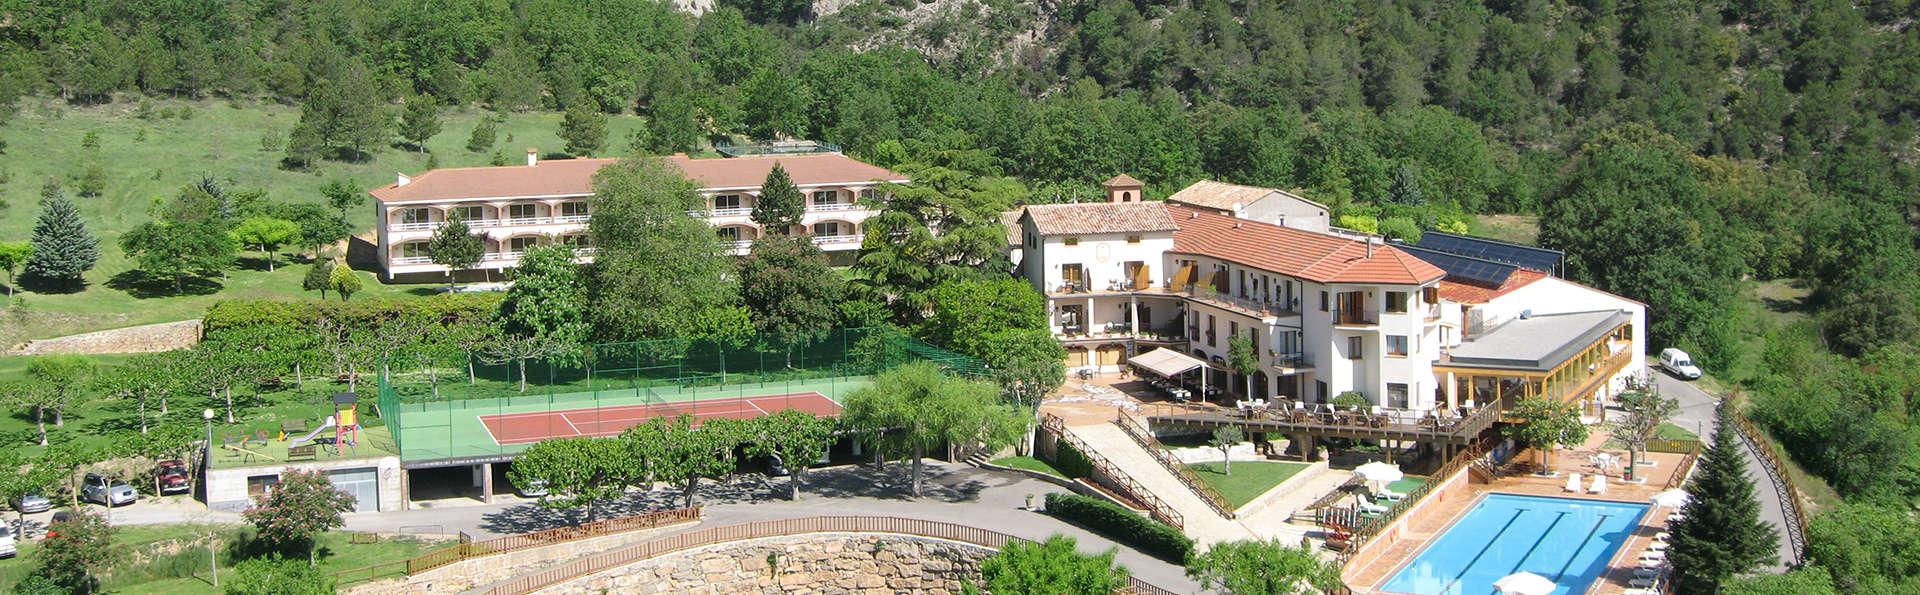 Hotel Restaurant Can Boix De Peramola - edit_CANBOIX_0128.jpg